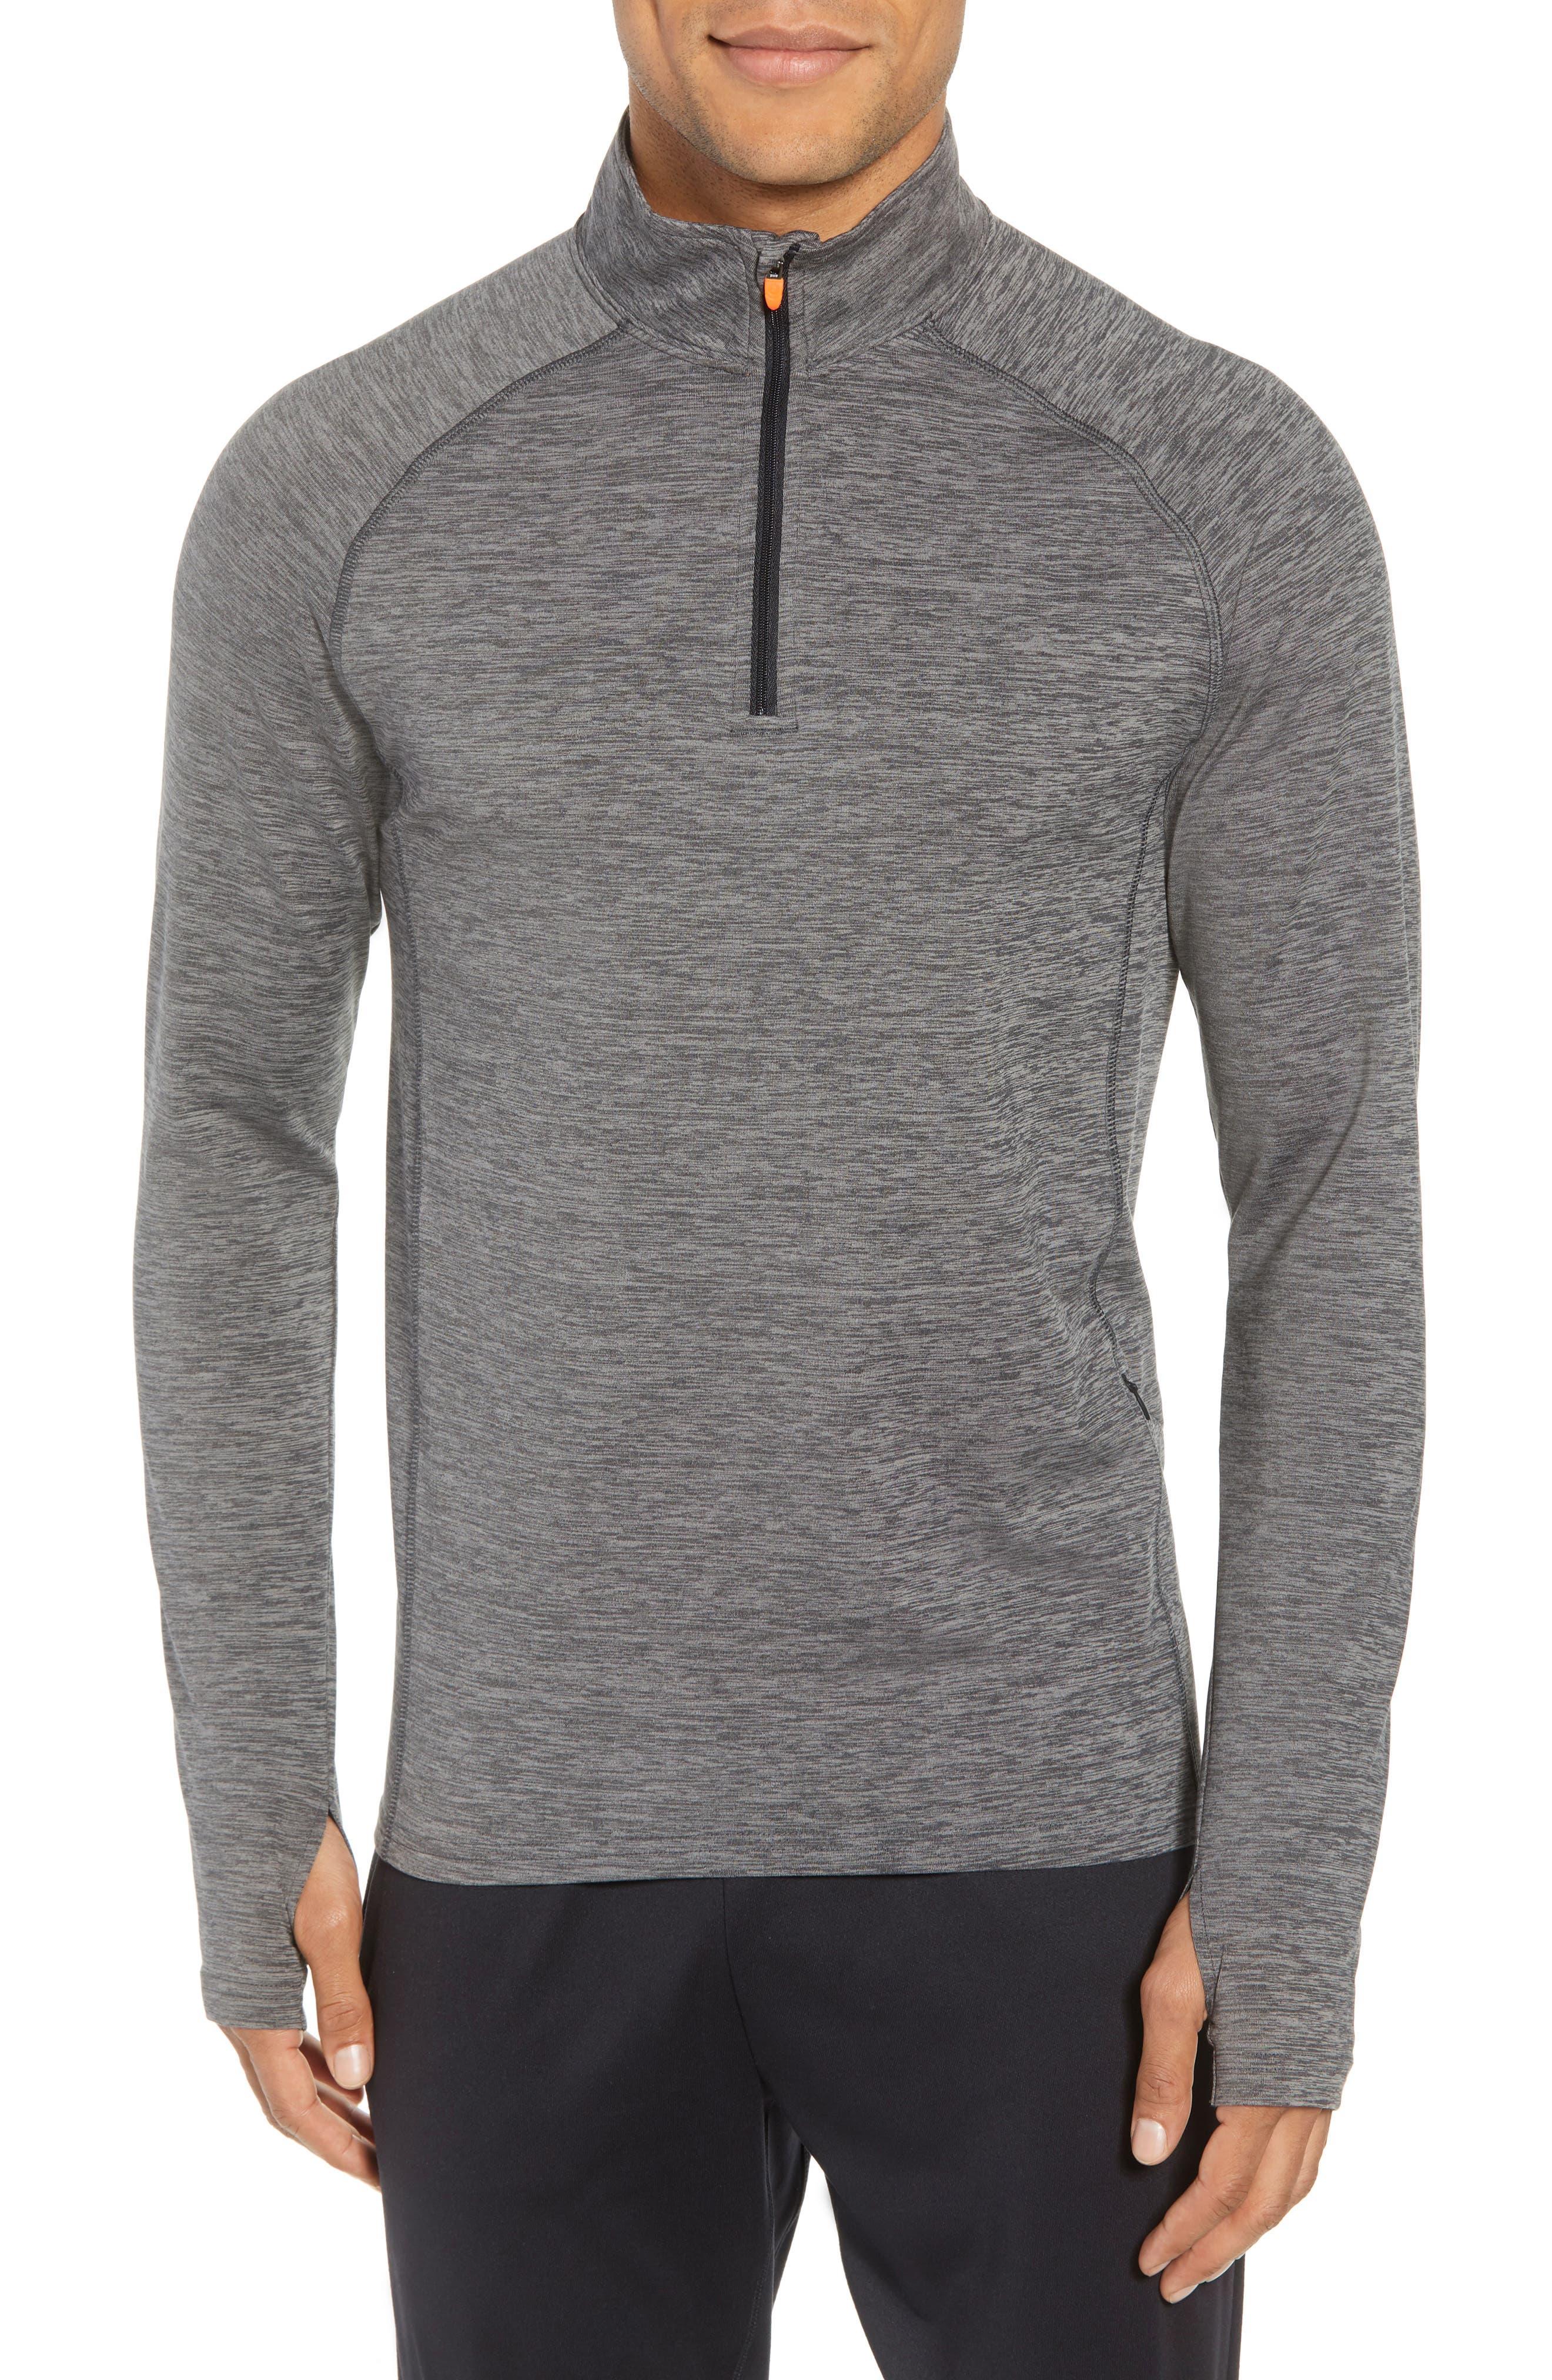 Core Half Zip Sweatshirt,                             Main thumbnail 1, color,                             Black Pepper Spacedye